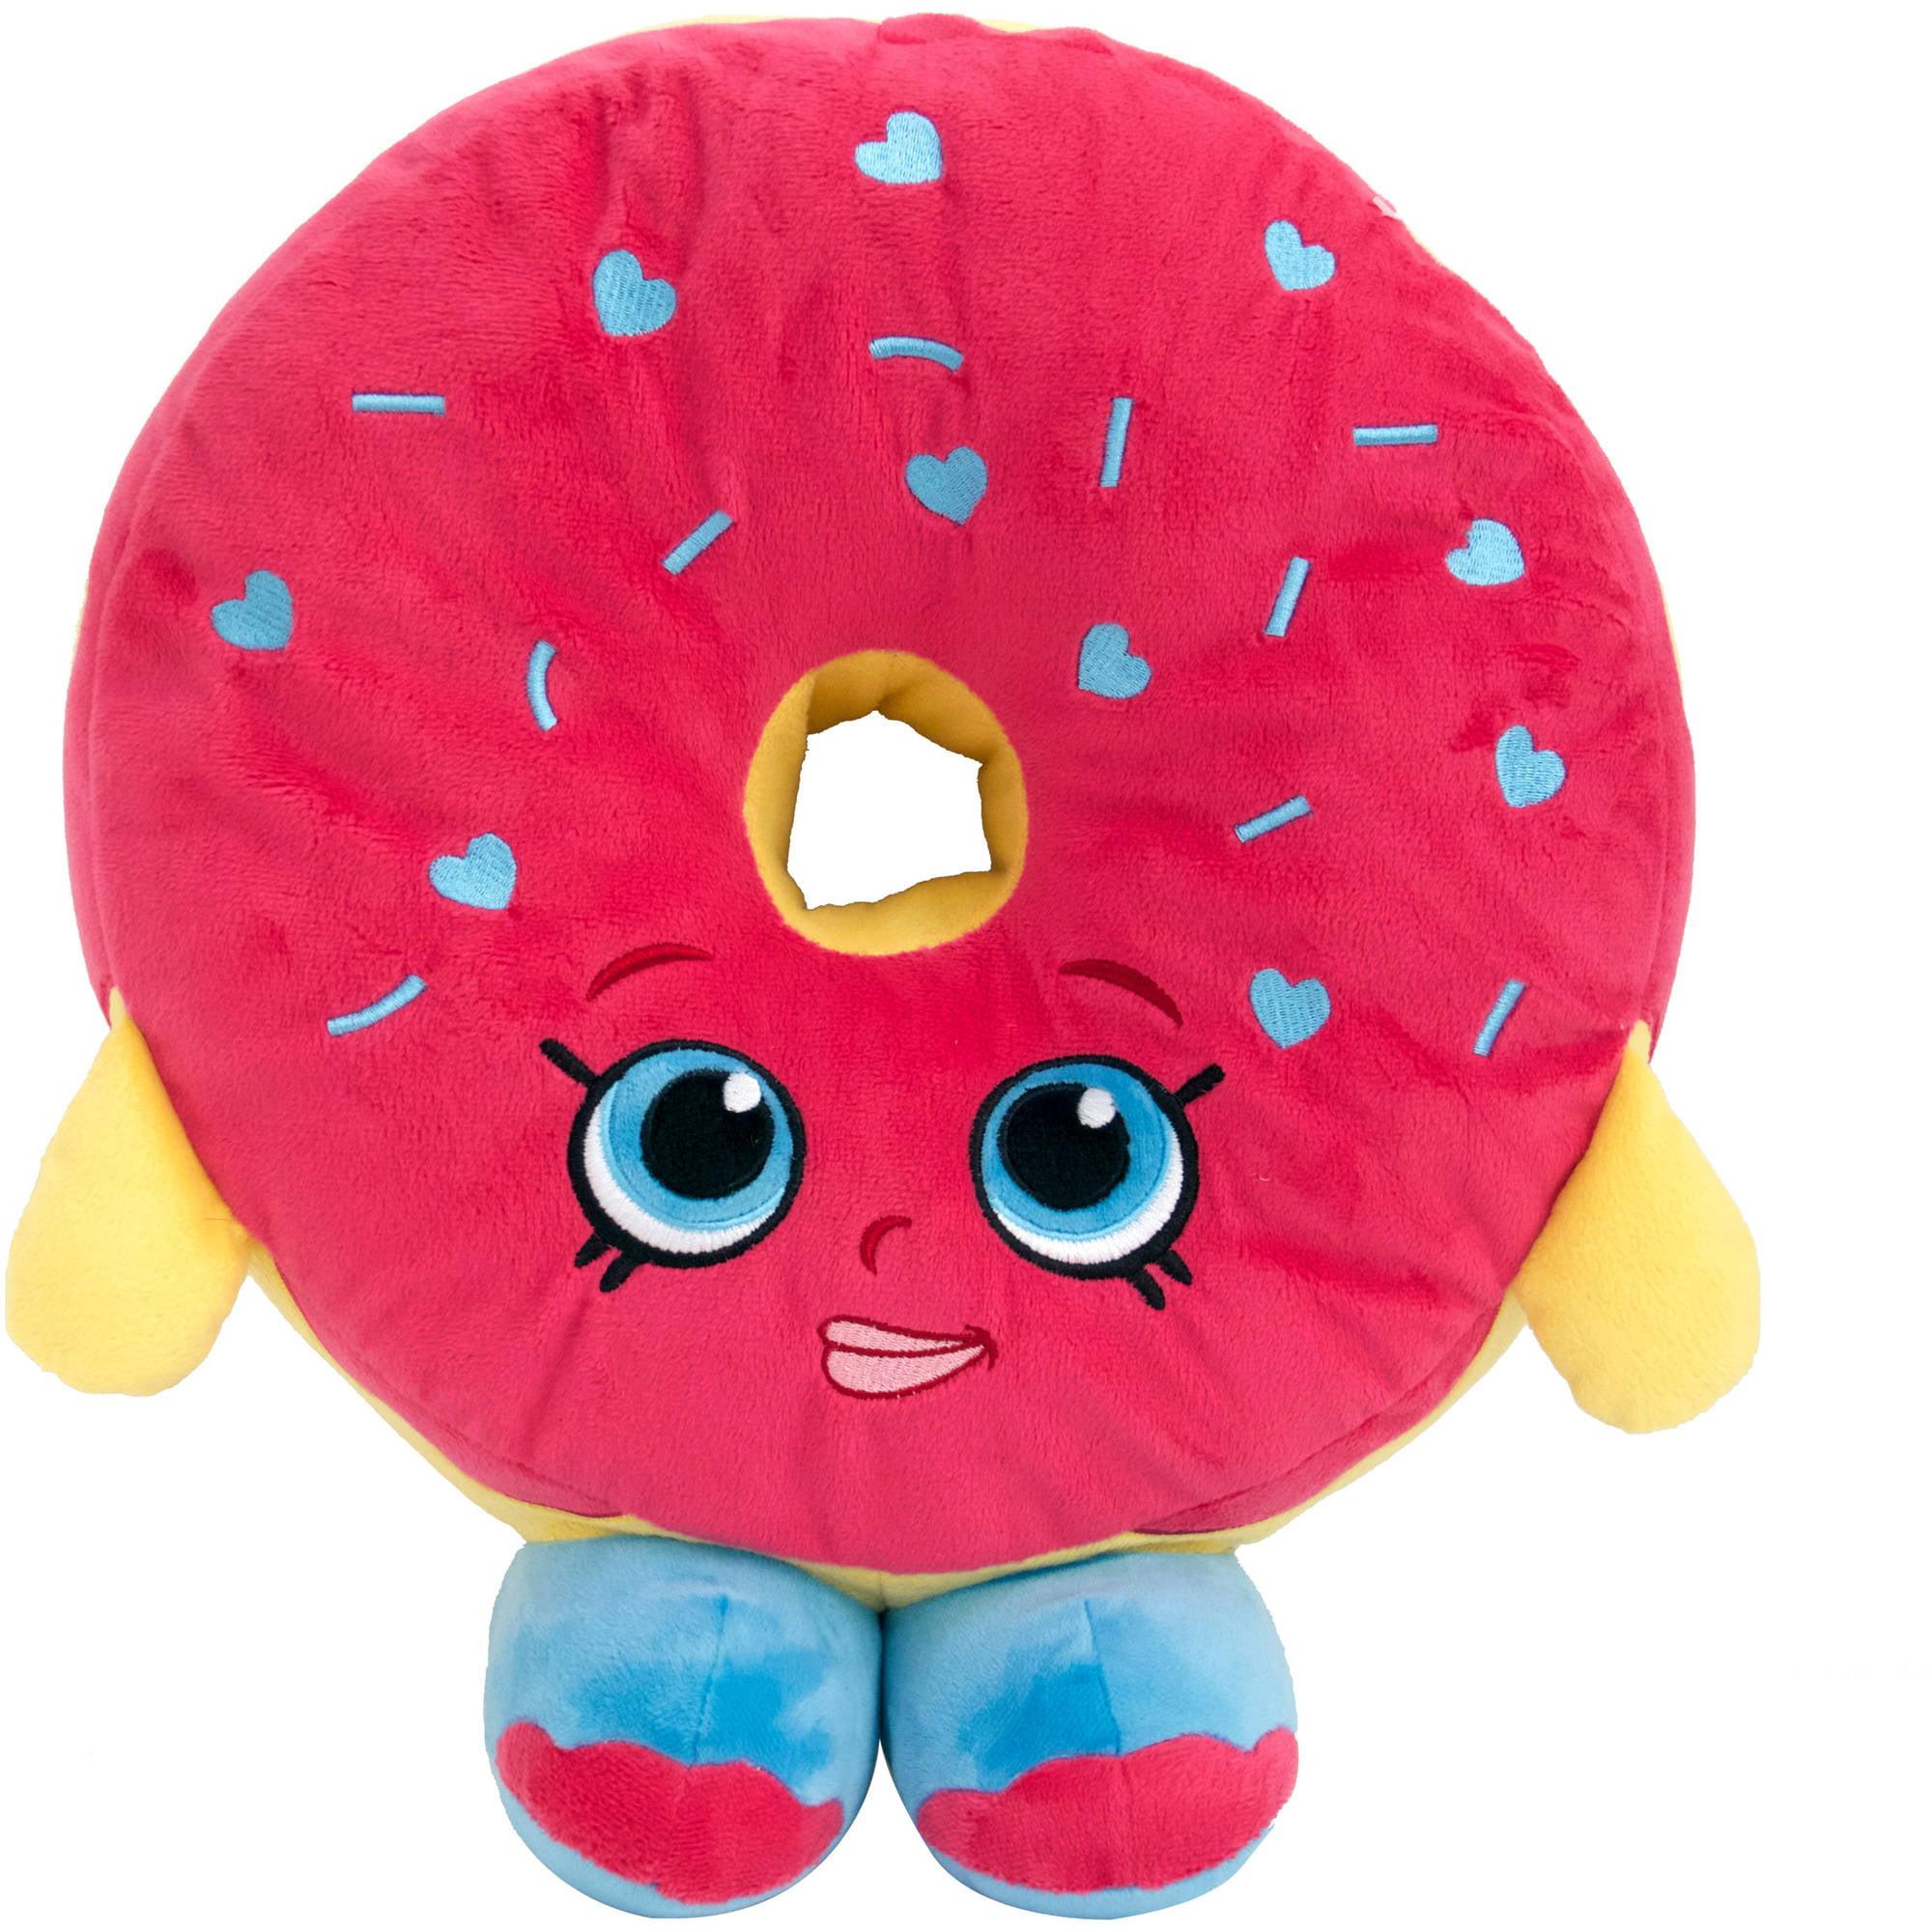 Shopkins D'Lish Donut Pillow Buddy